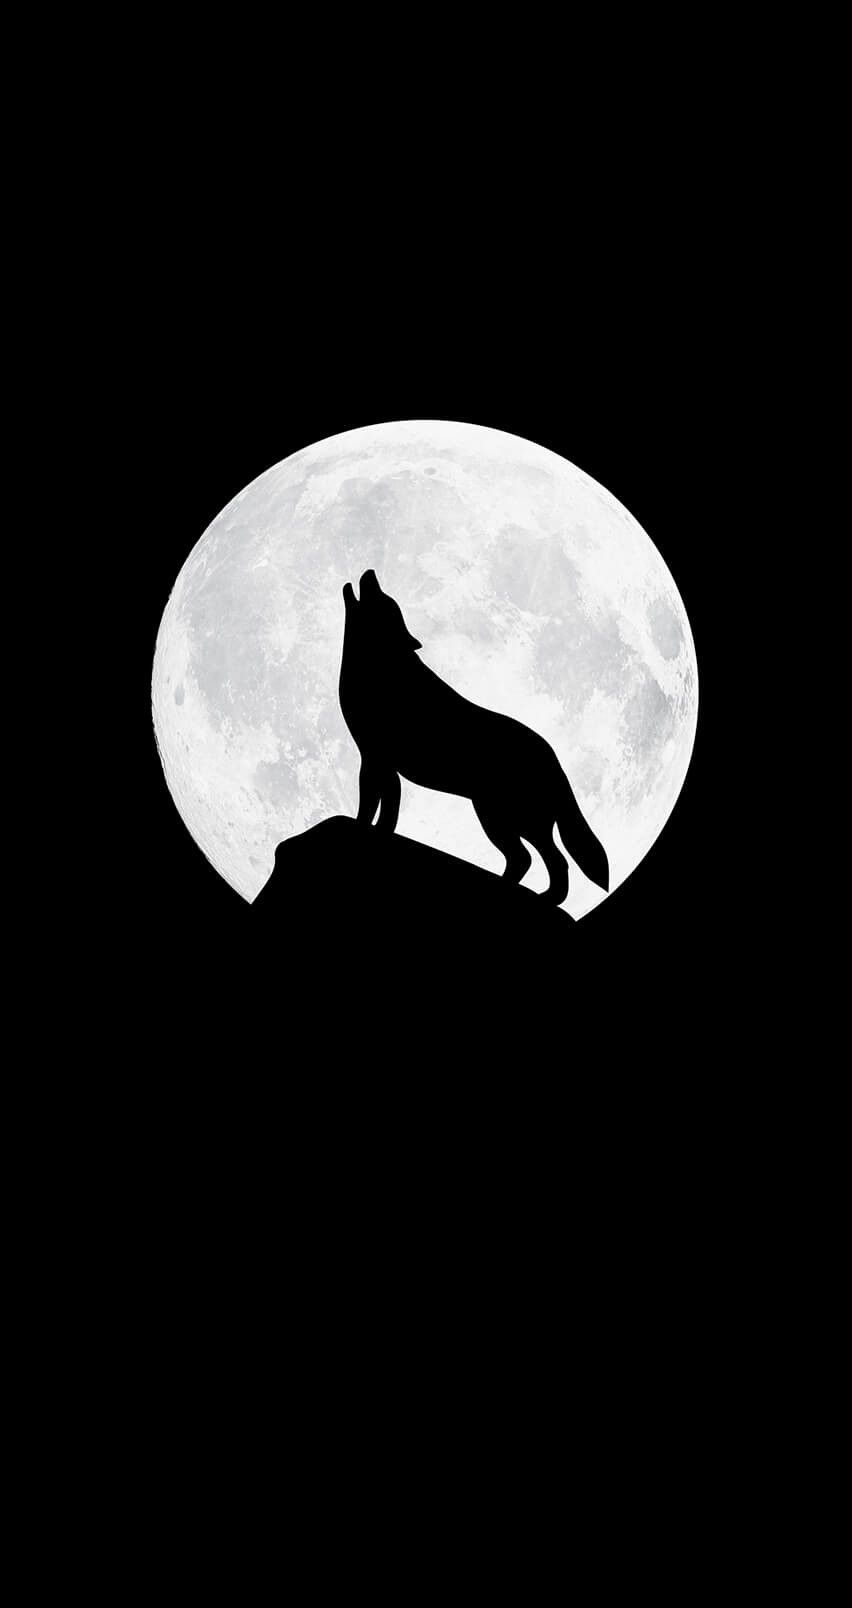 Dark Wolf Hd Wallpapers For Mobile Wallpaperzen Org